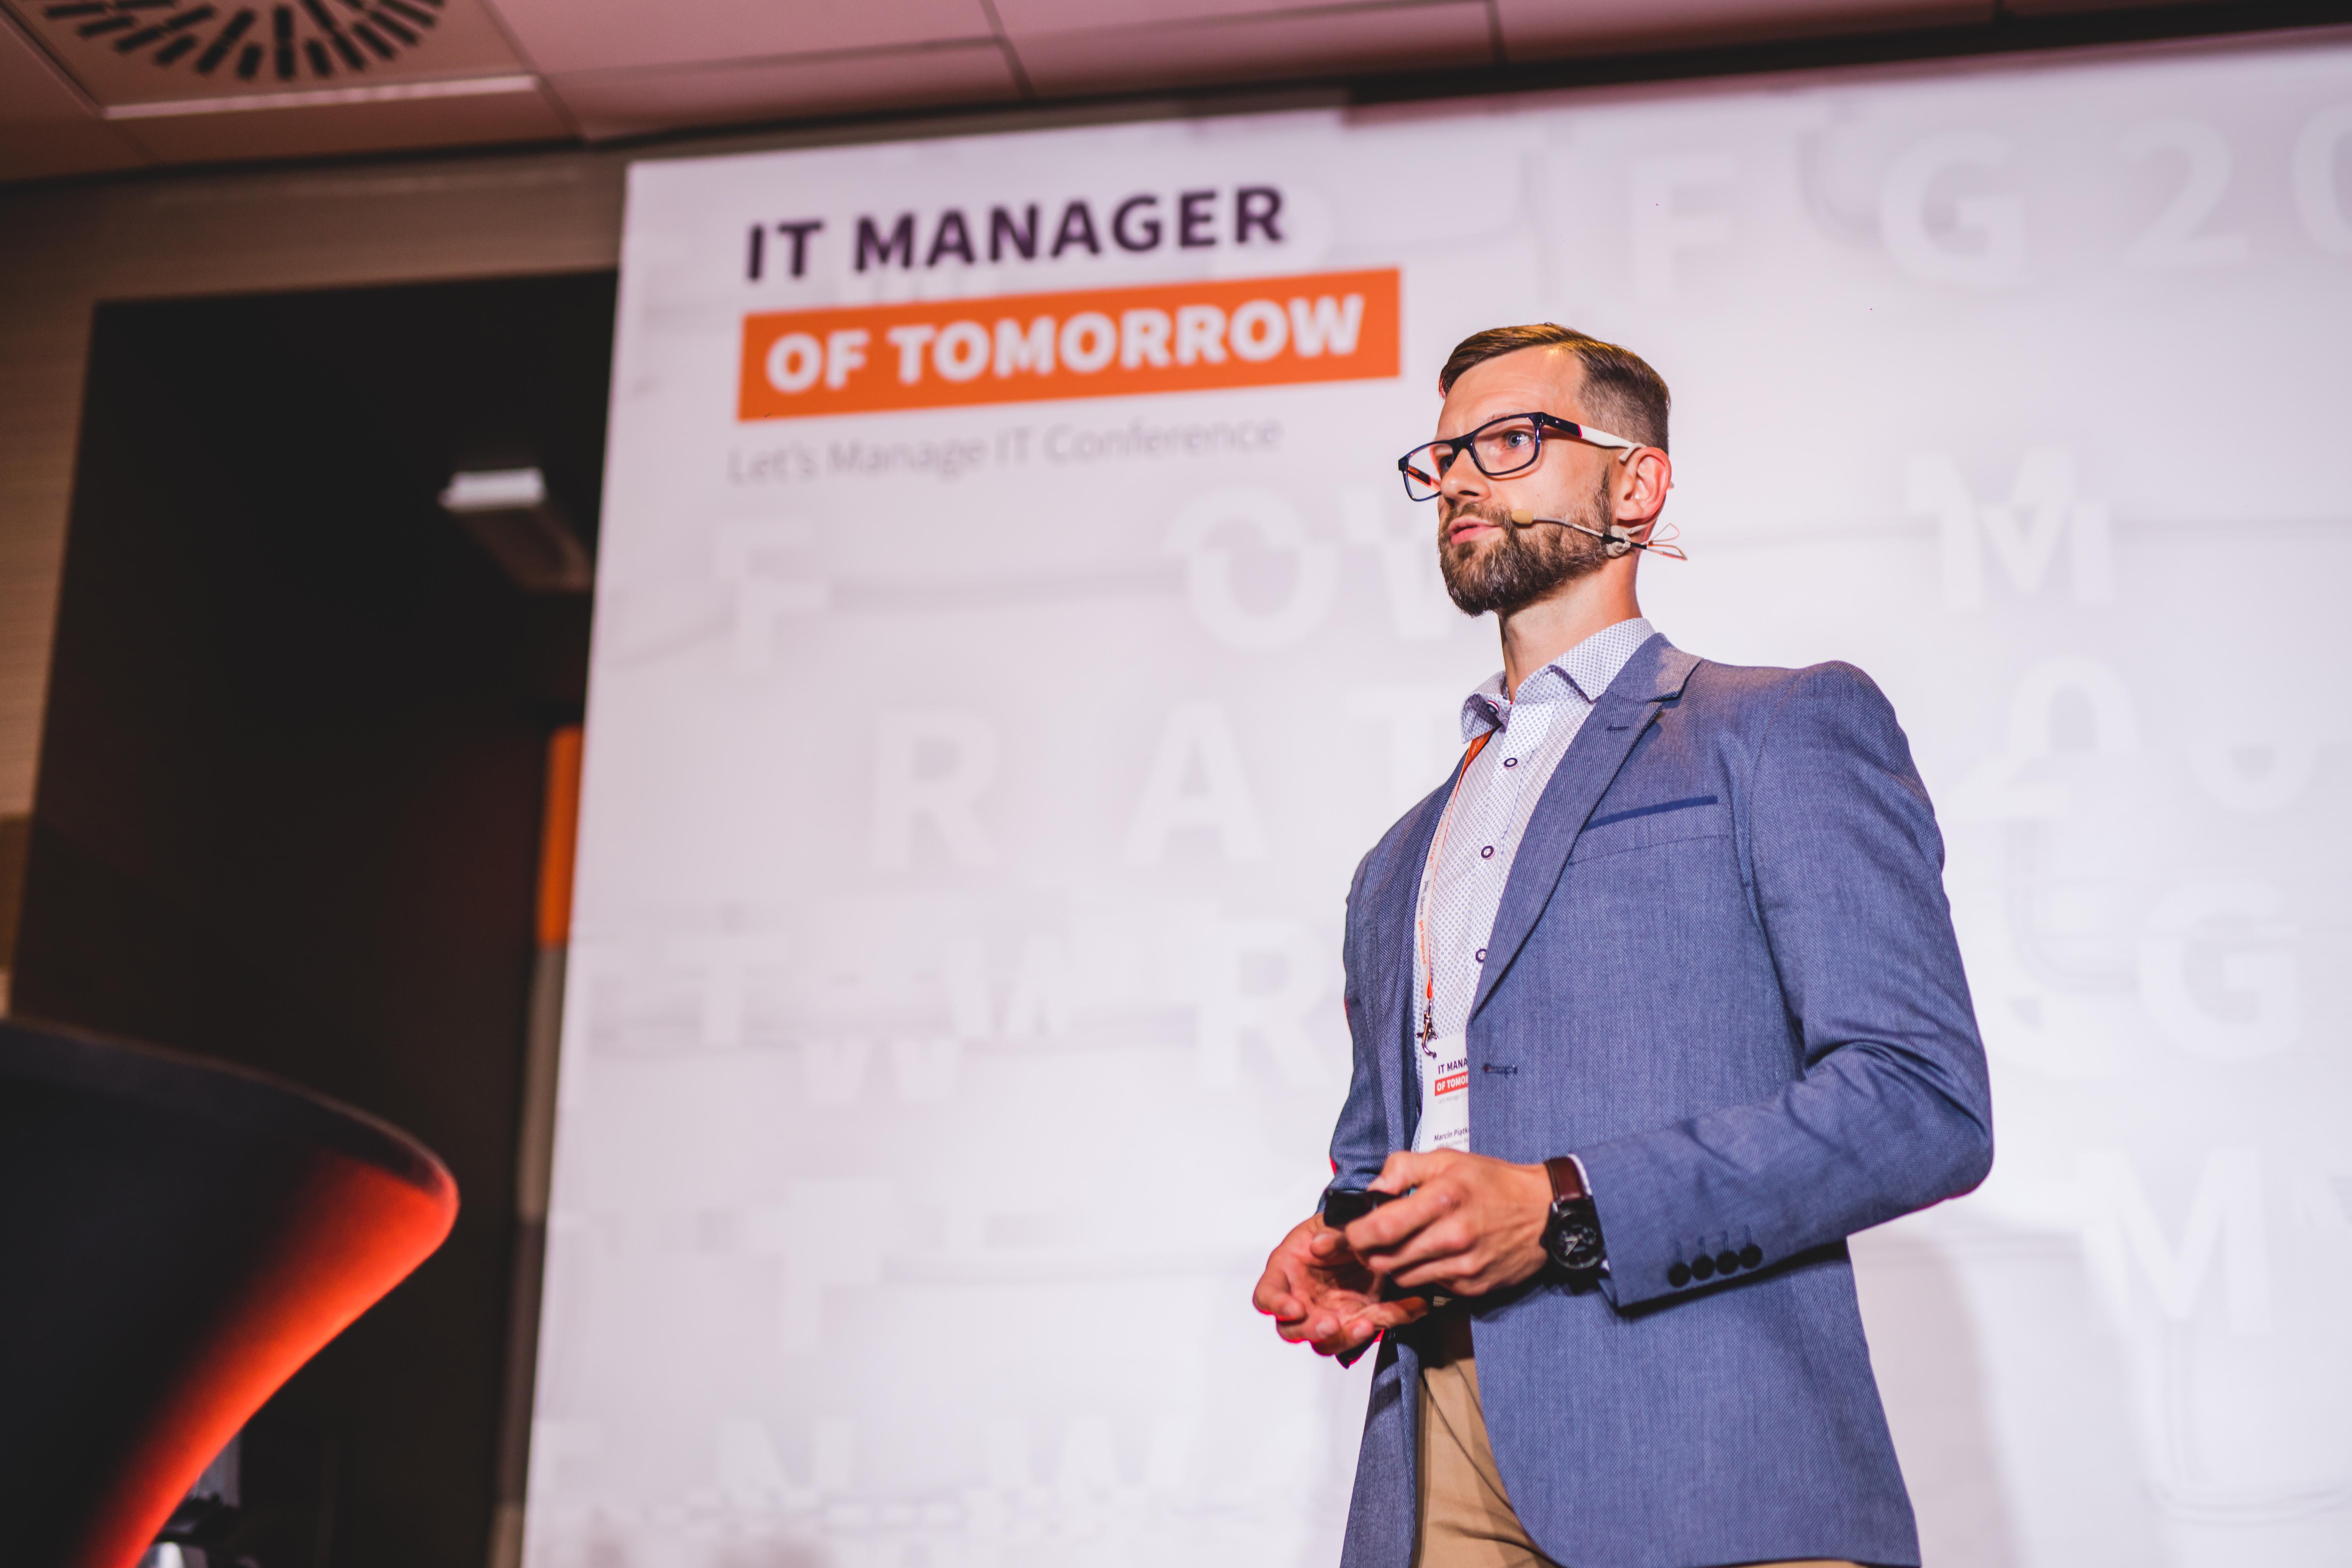 I am speaker at IT Manager of Tomorrow 2021 - Marcin Piątkowski